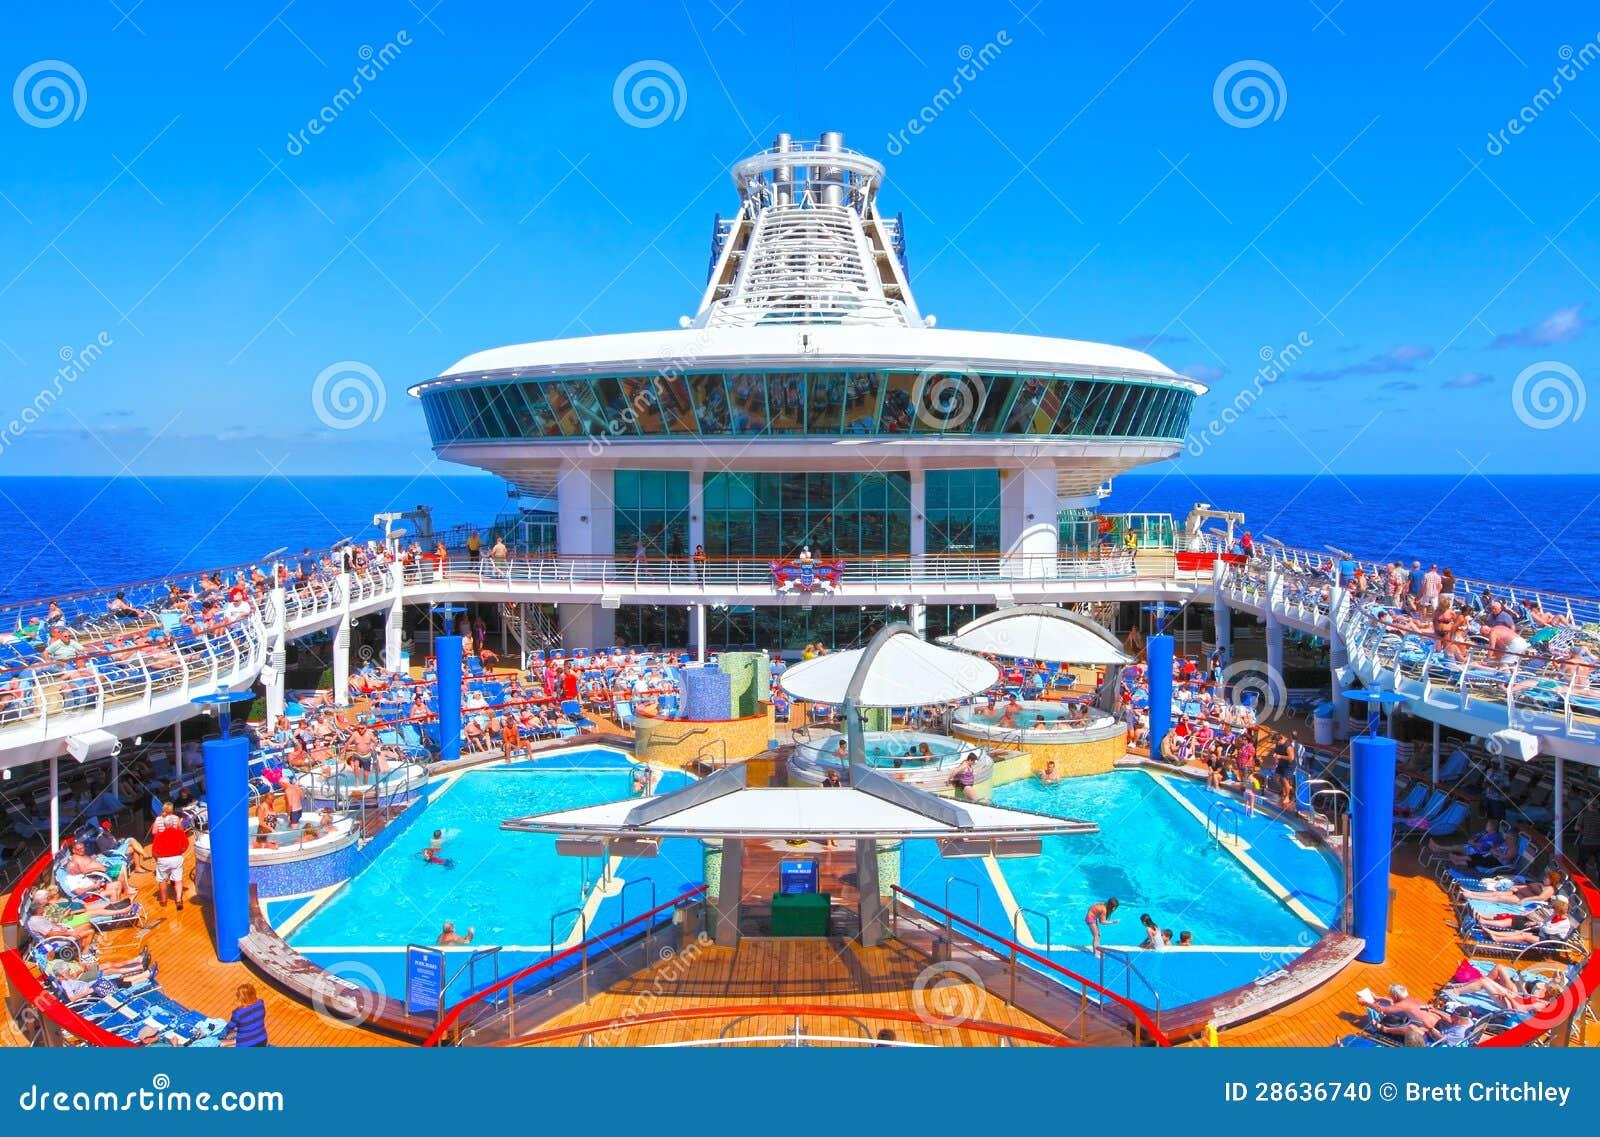 Cruise Ship Pool Deck Editorial Image Image Of Kids 28636740